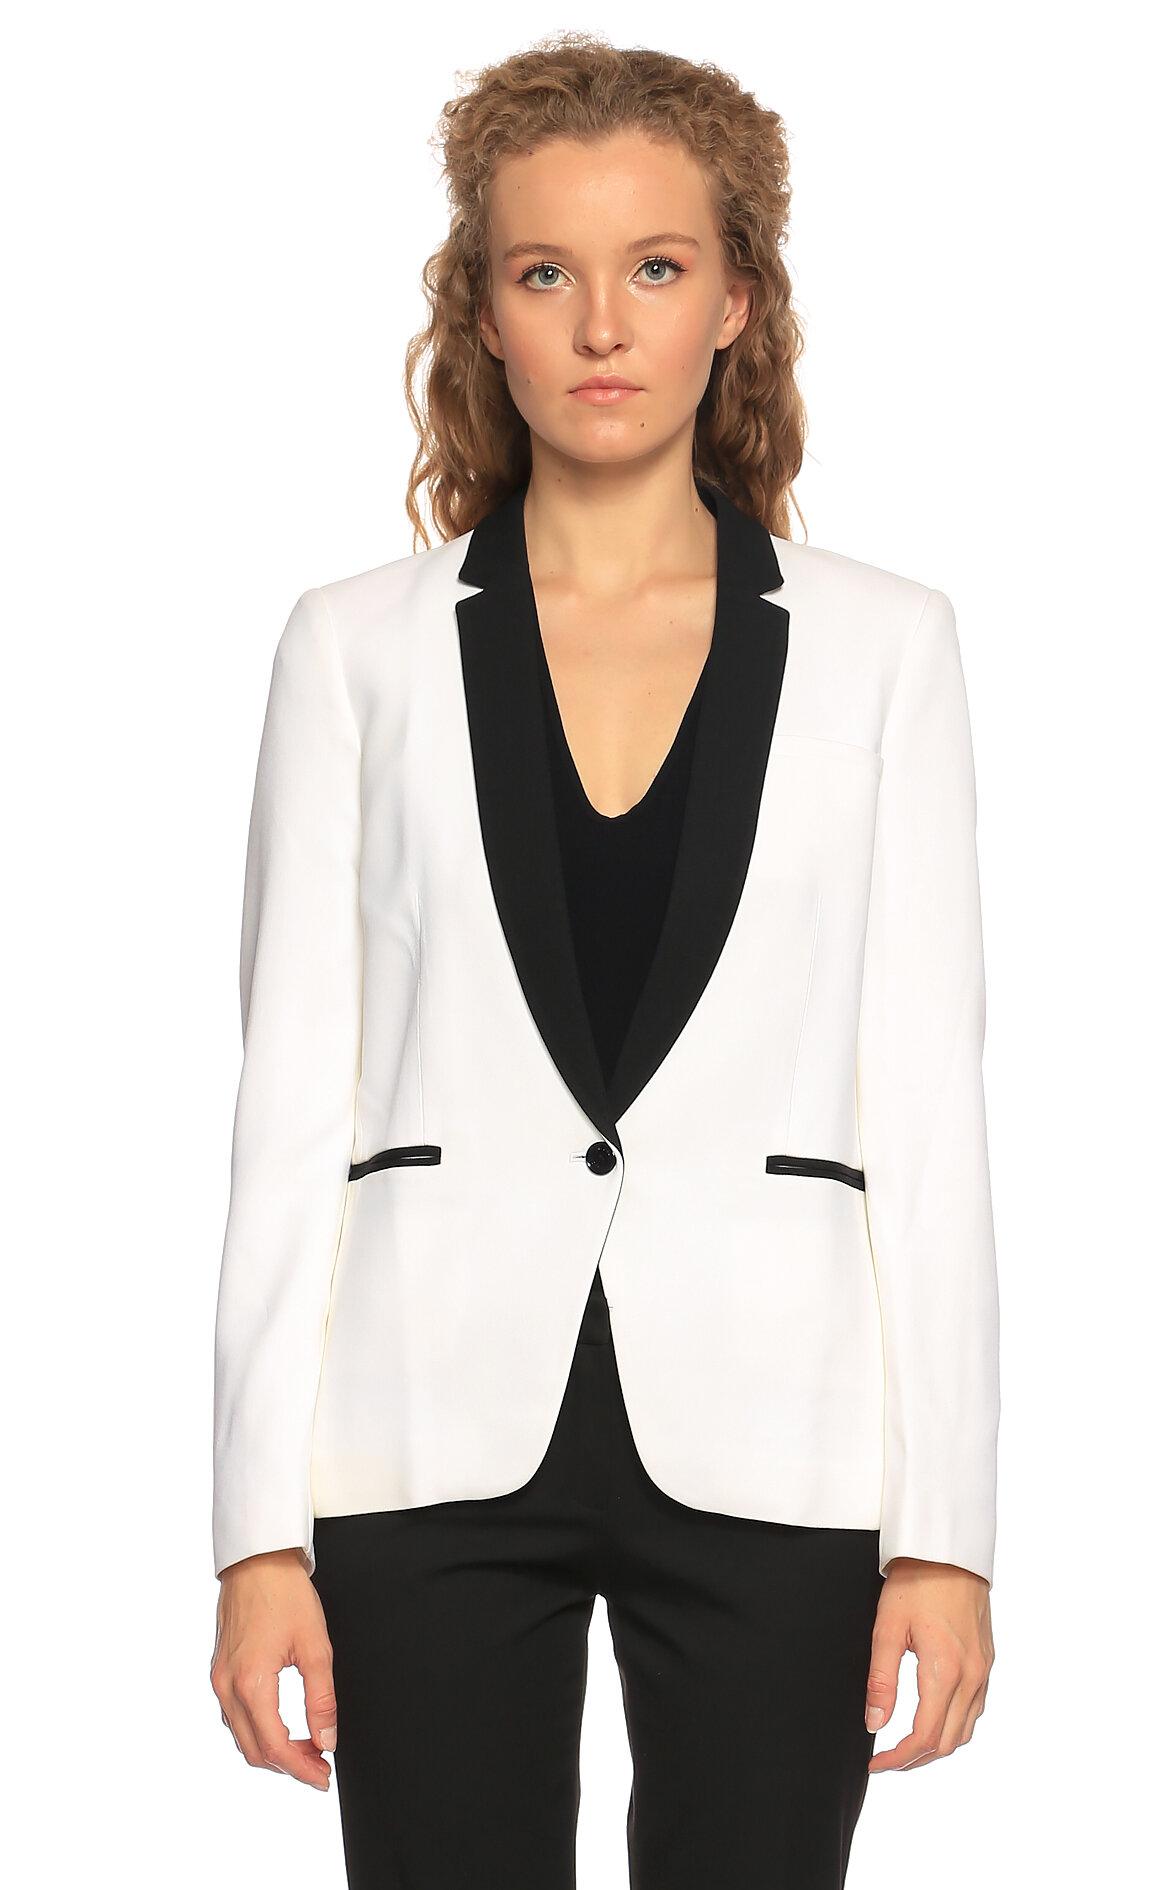 Michael Kors Collection  Beyaz Siyah Ceket